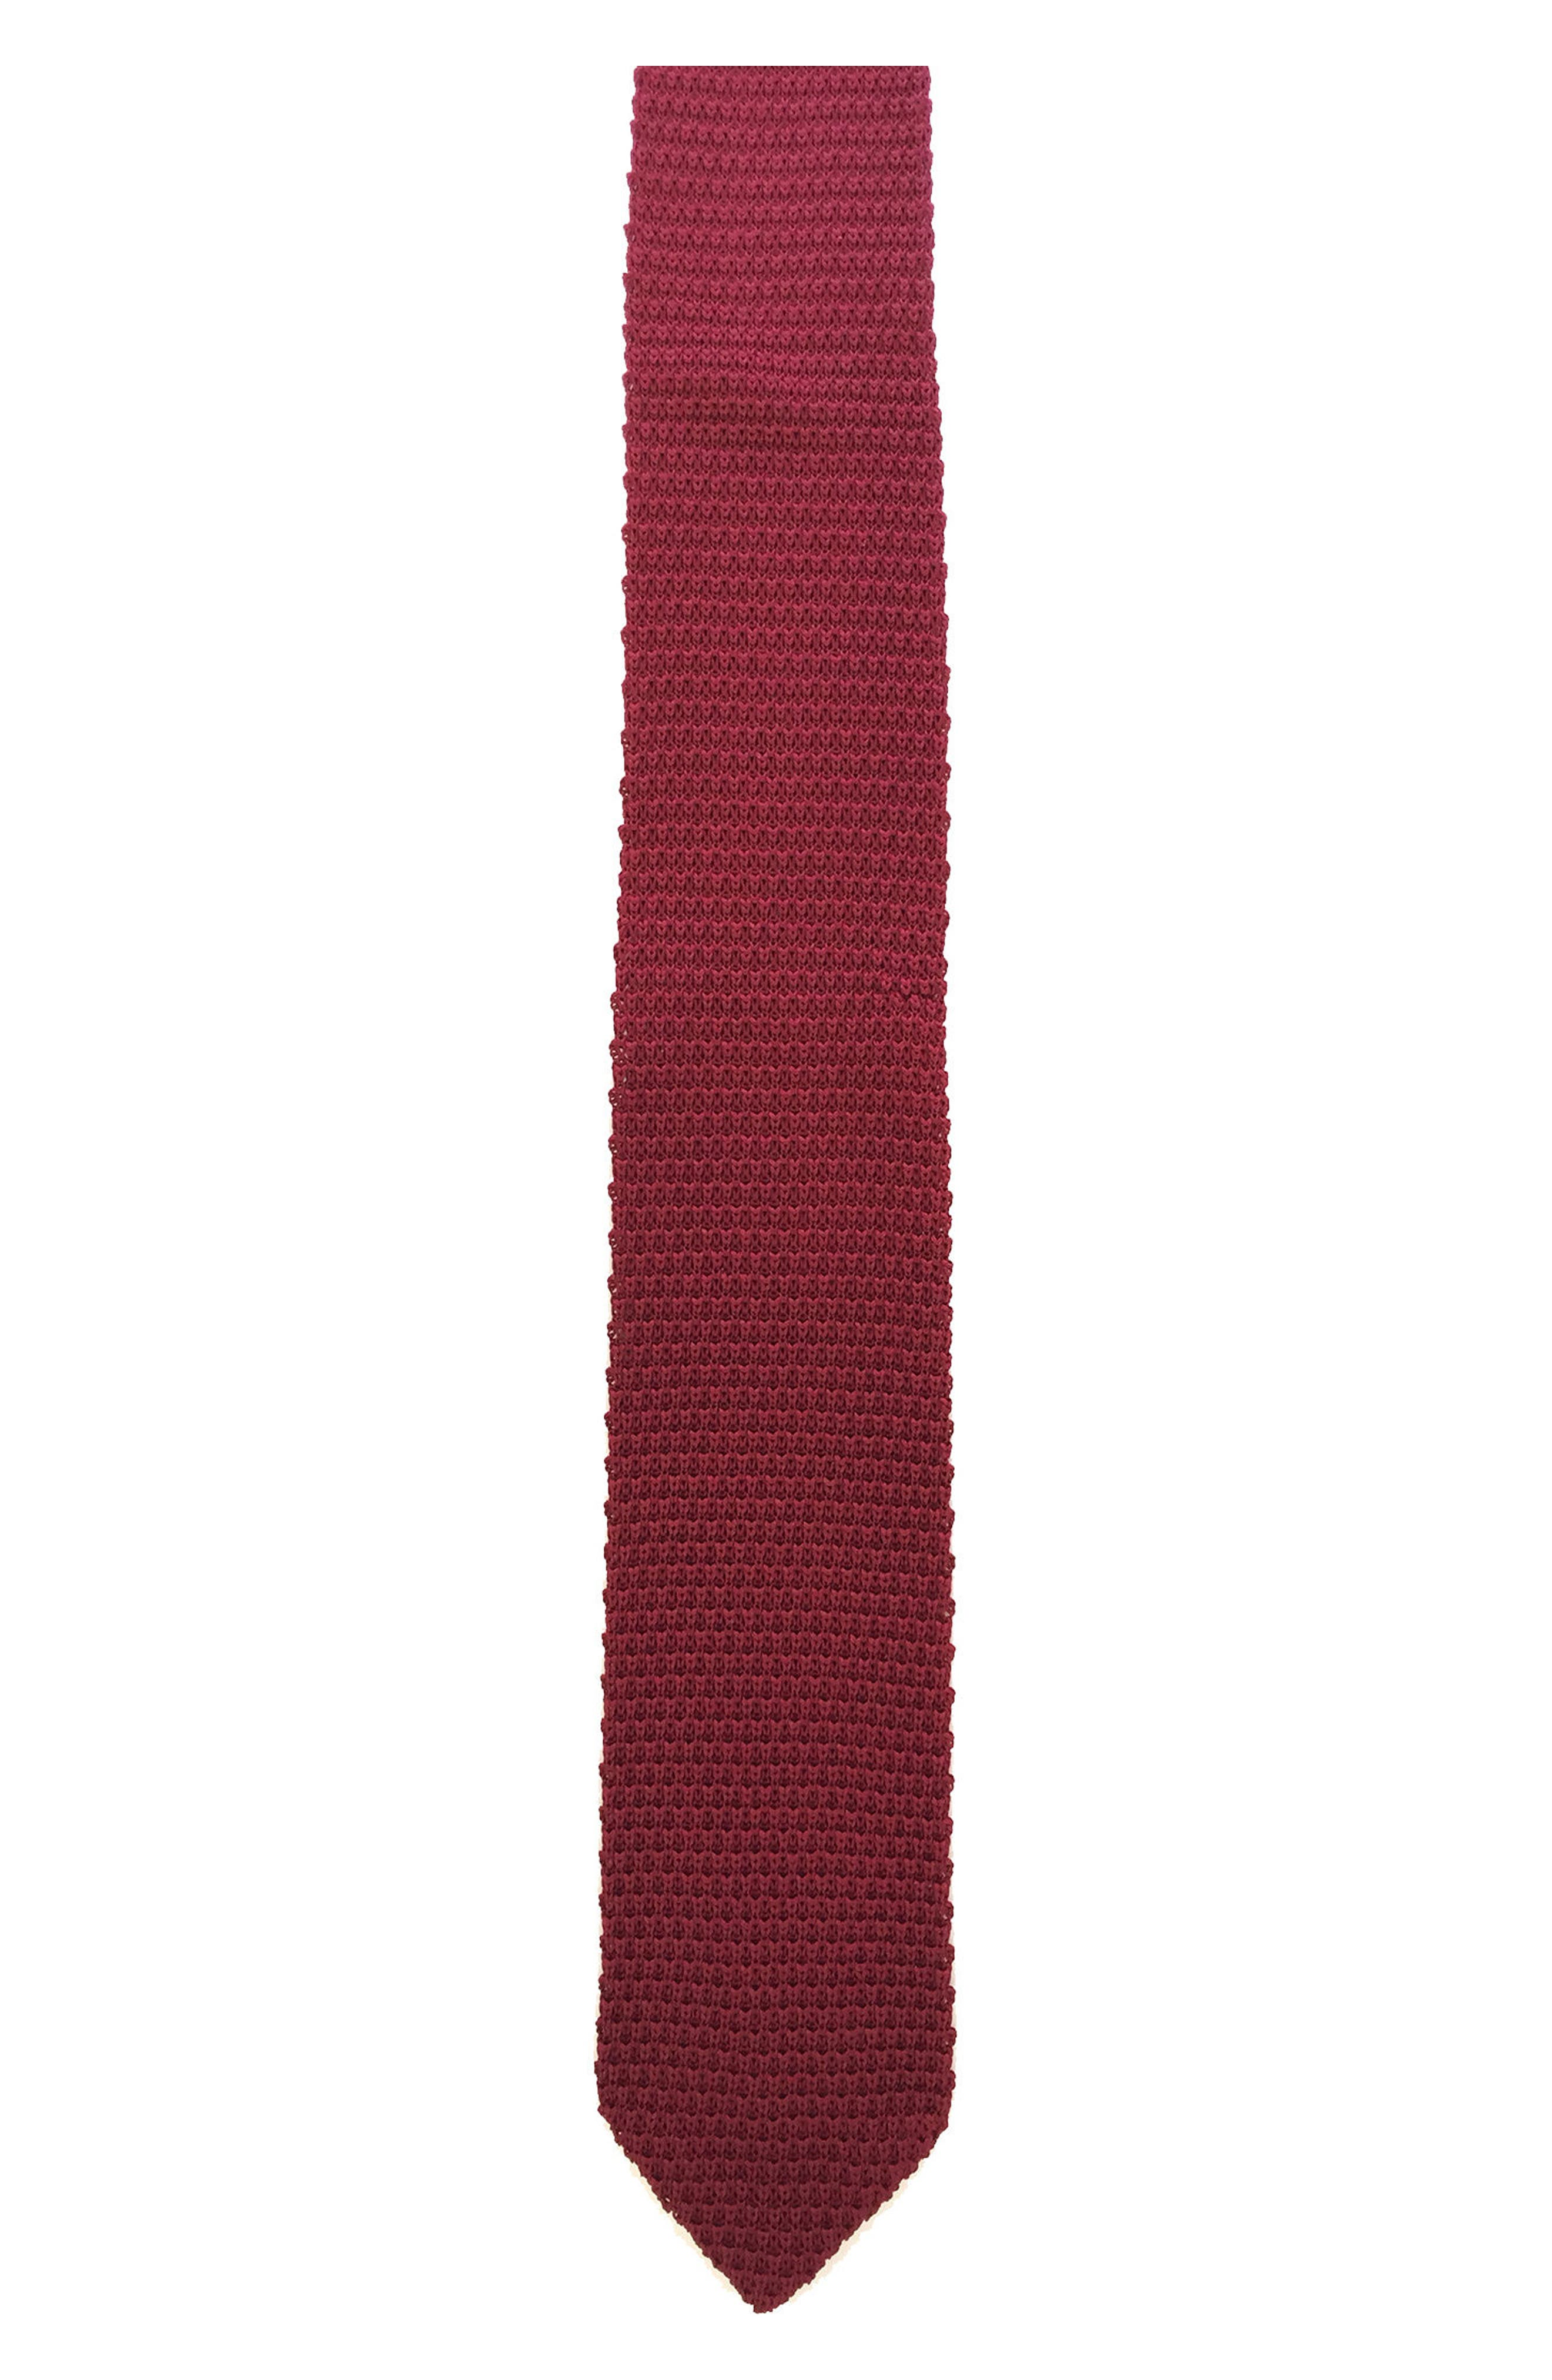 hook + ALBERT Solid Staple Knit Silk Tie